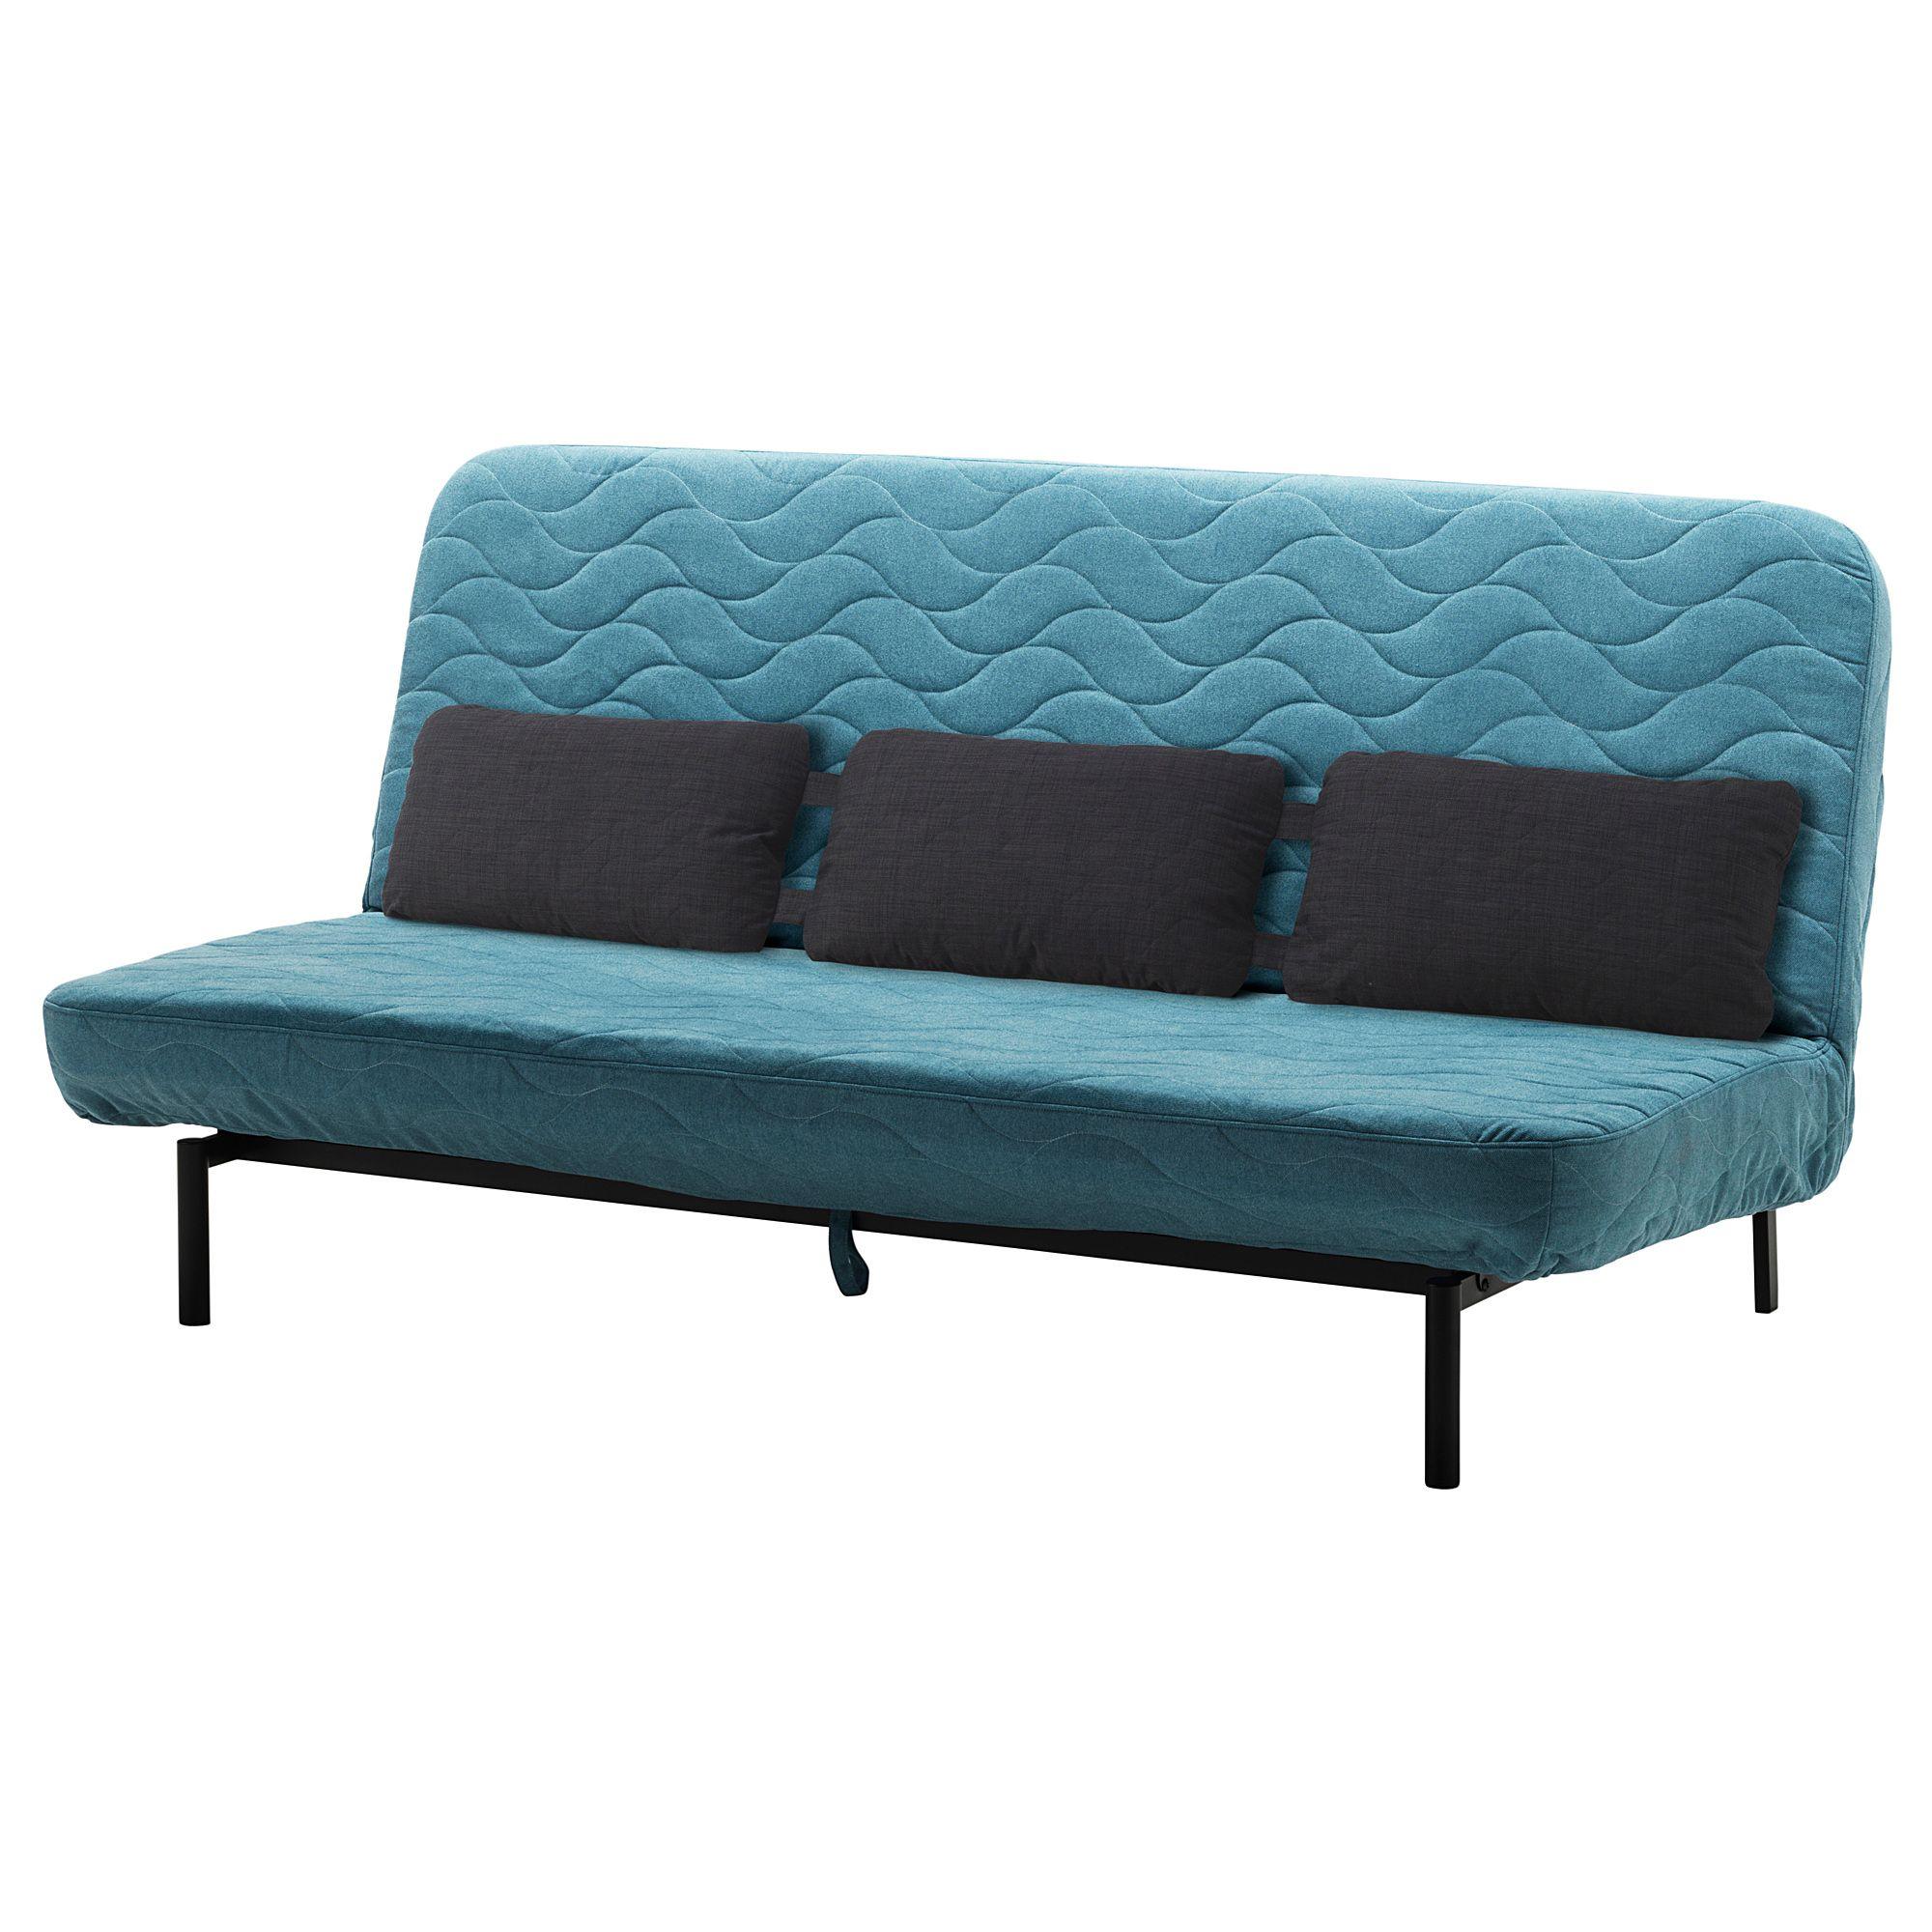 Furniture And Home Furnishings Ikea Sofa Bed Sleeper Sofa Ikea Sofa